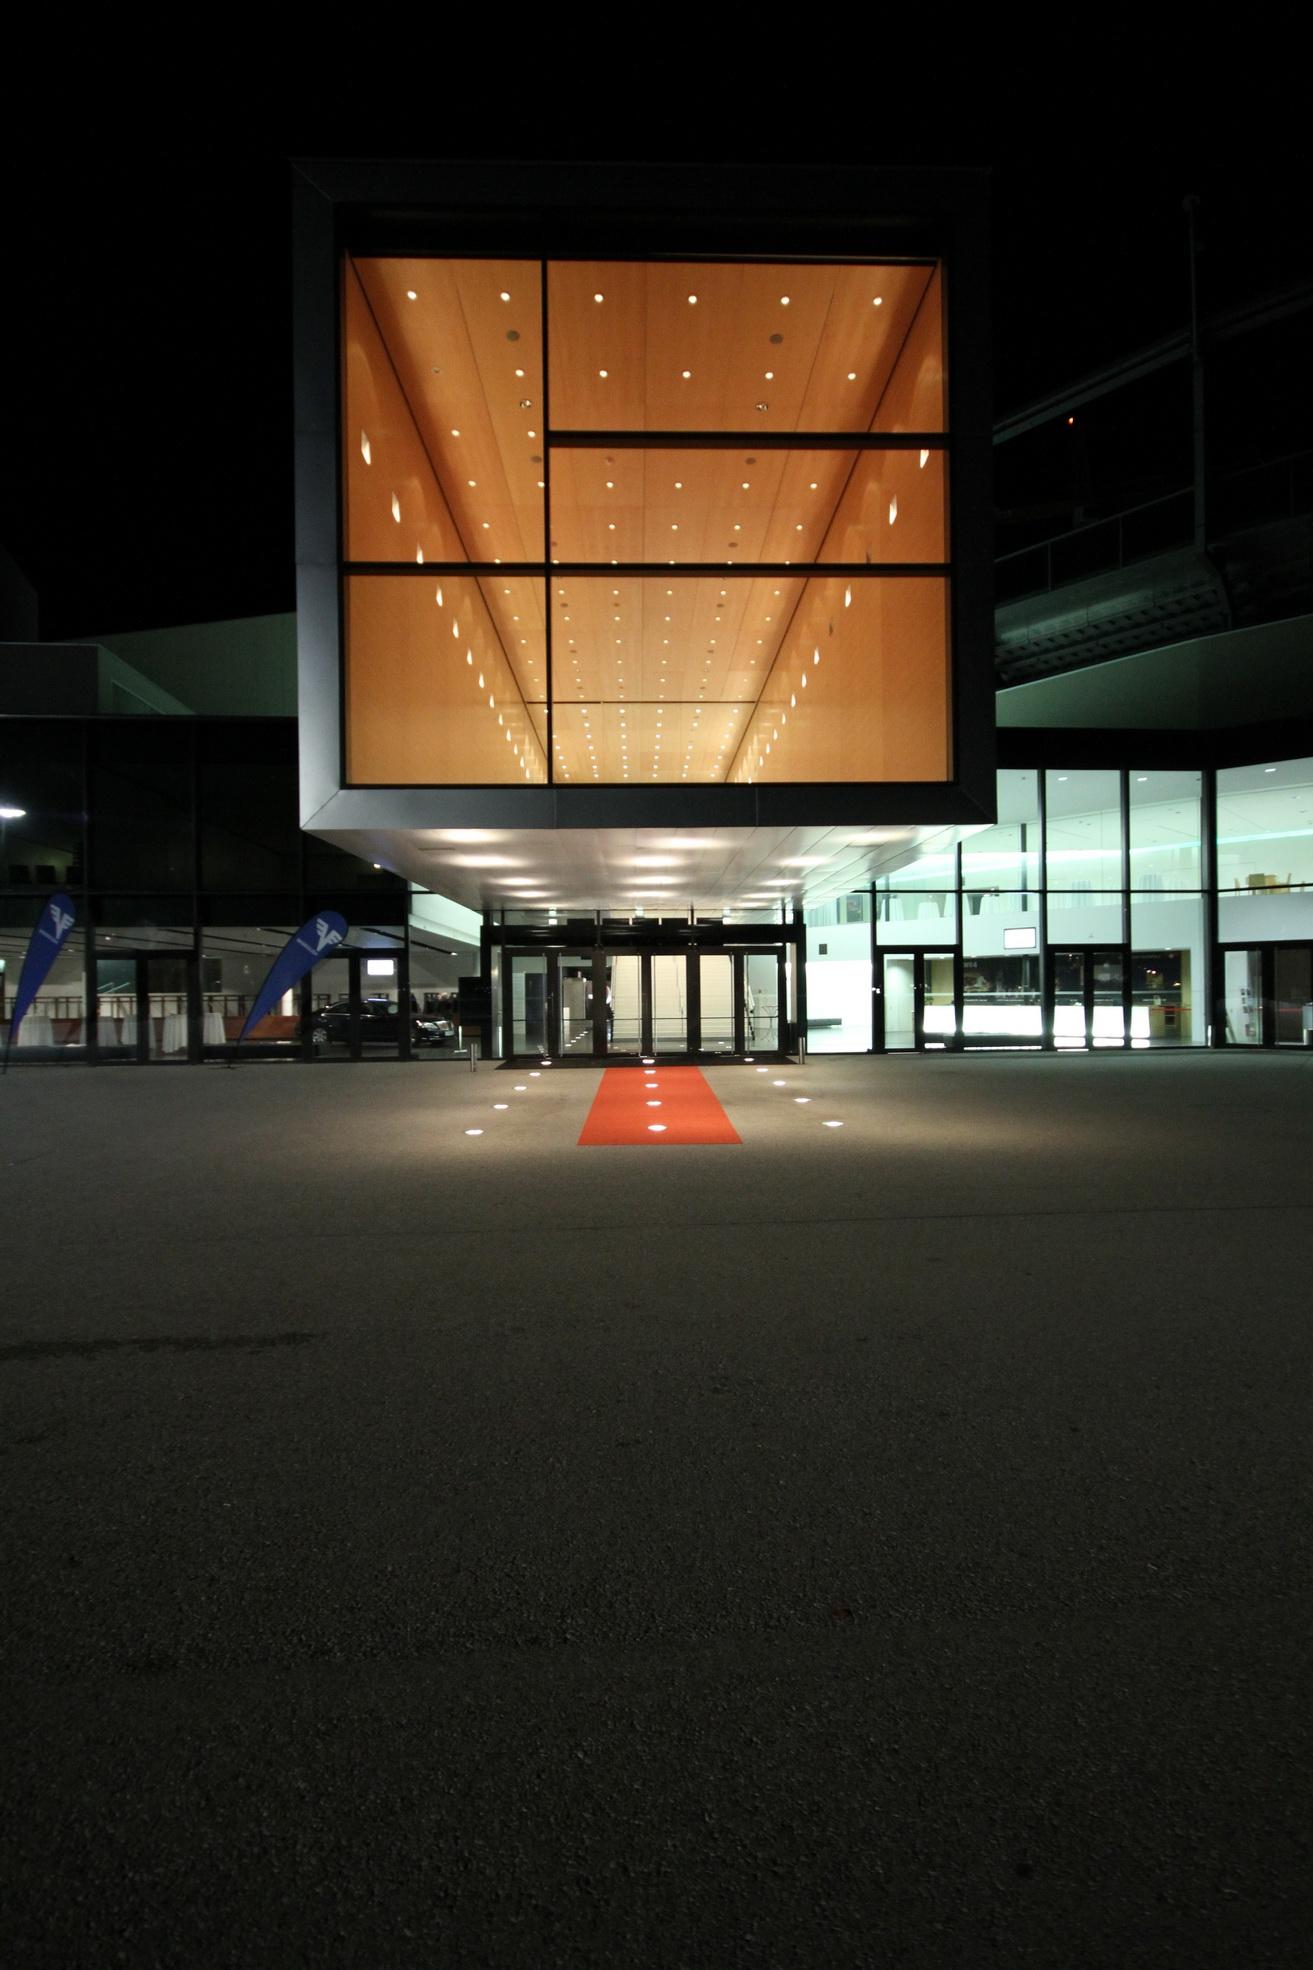 Bregenz-Festspielhaus-001.jpg